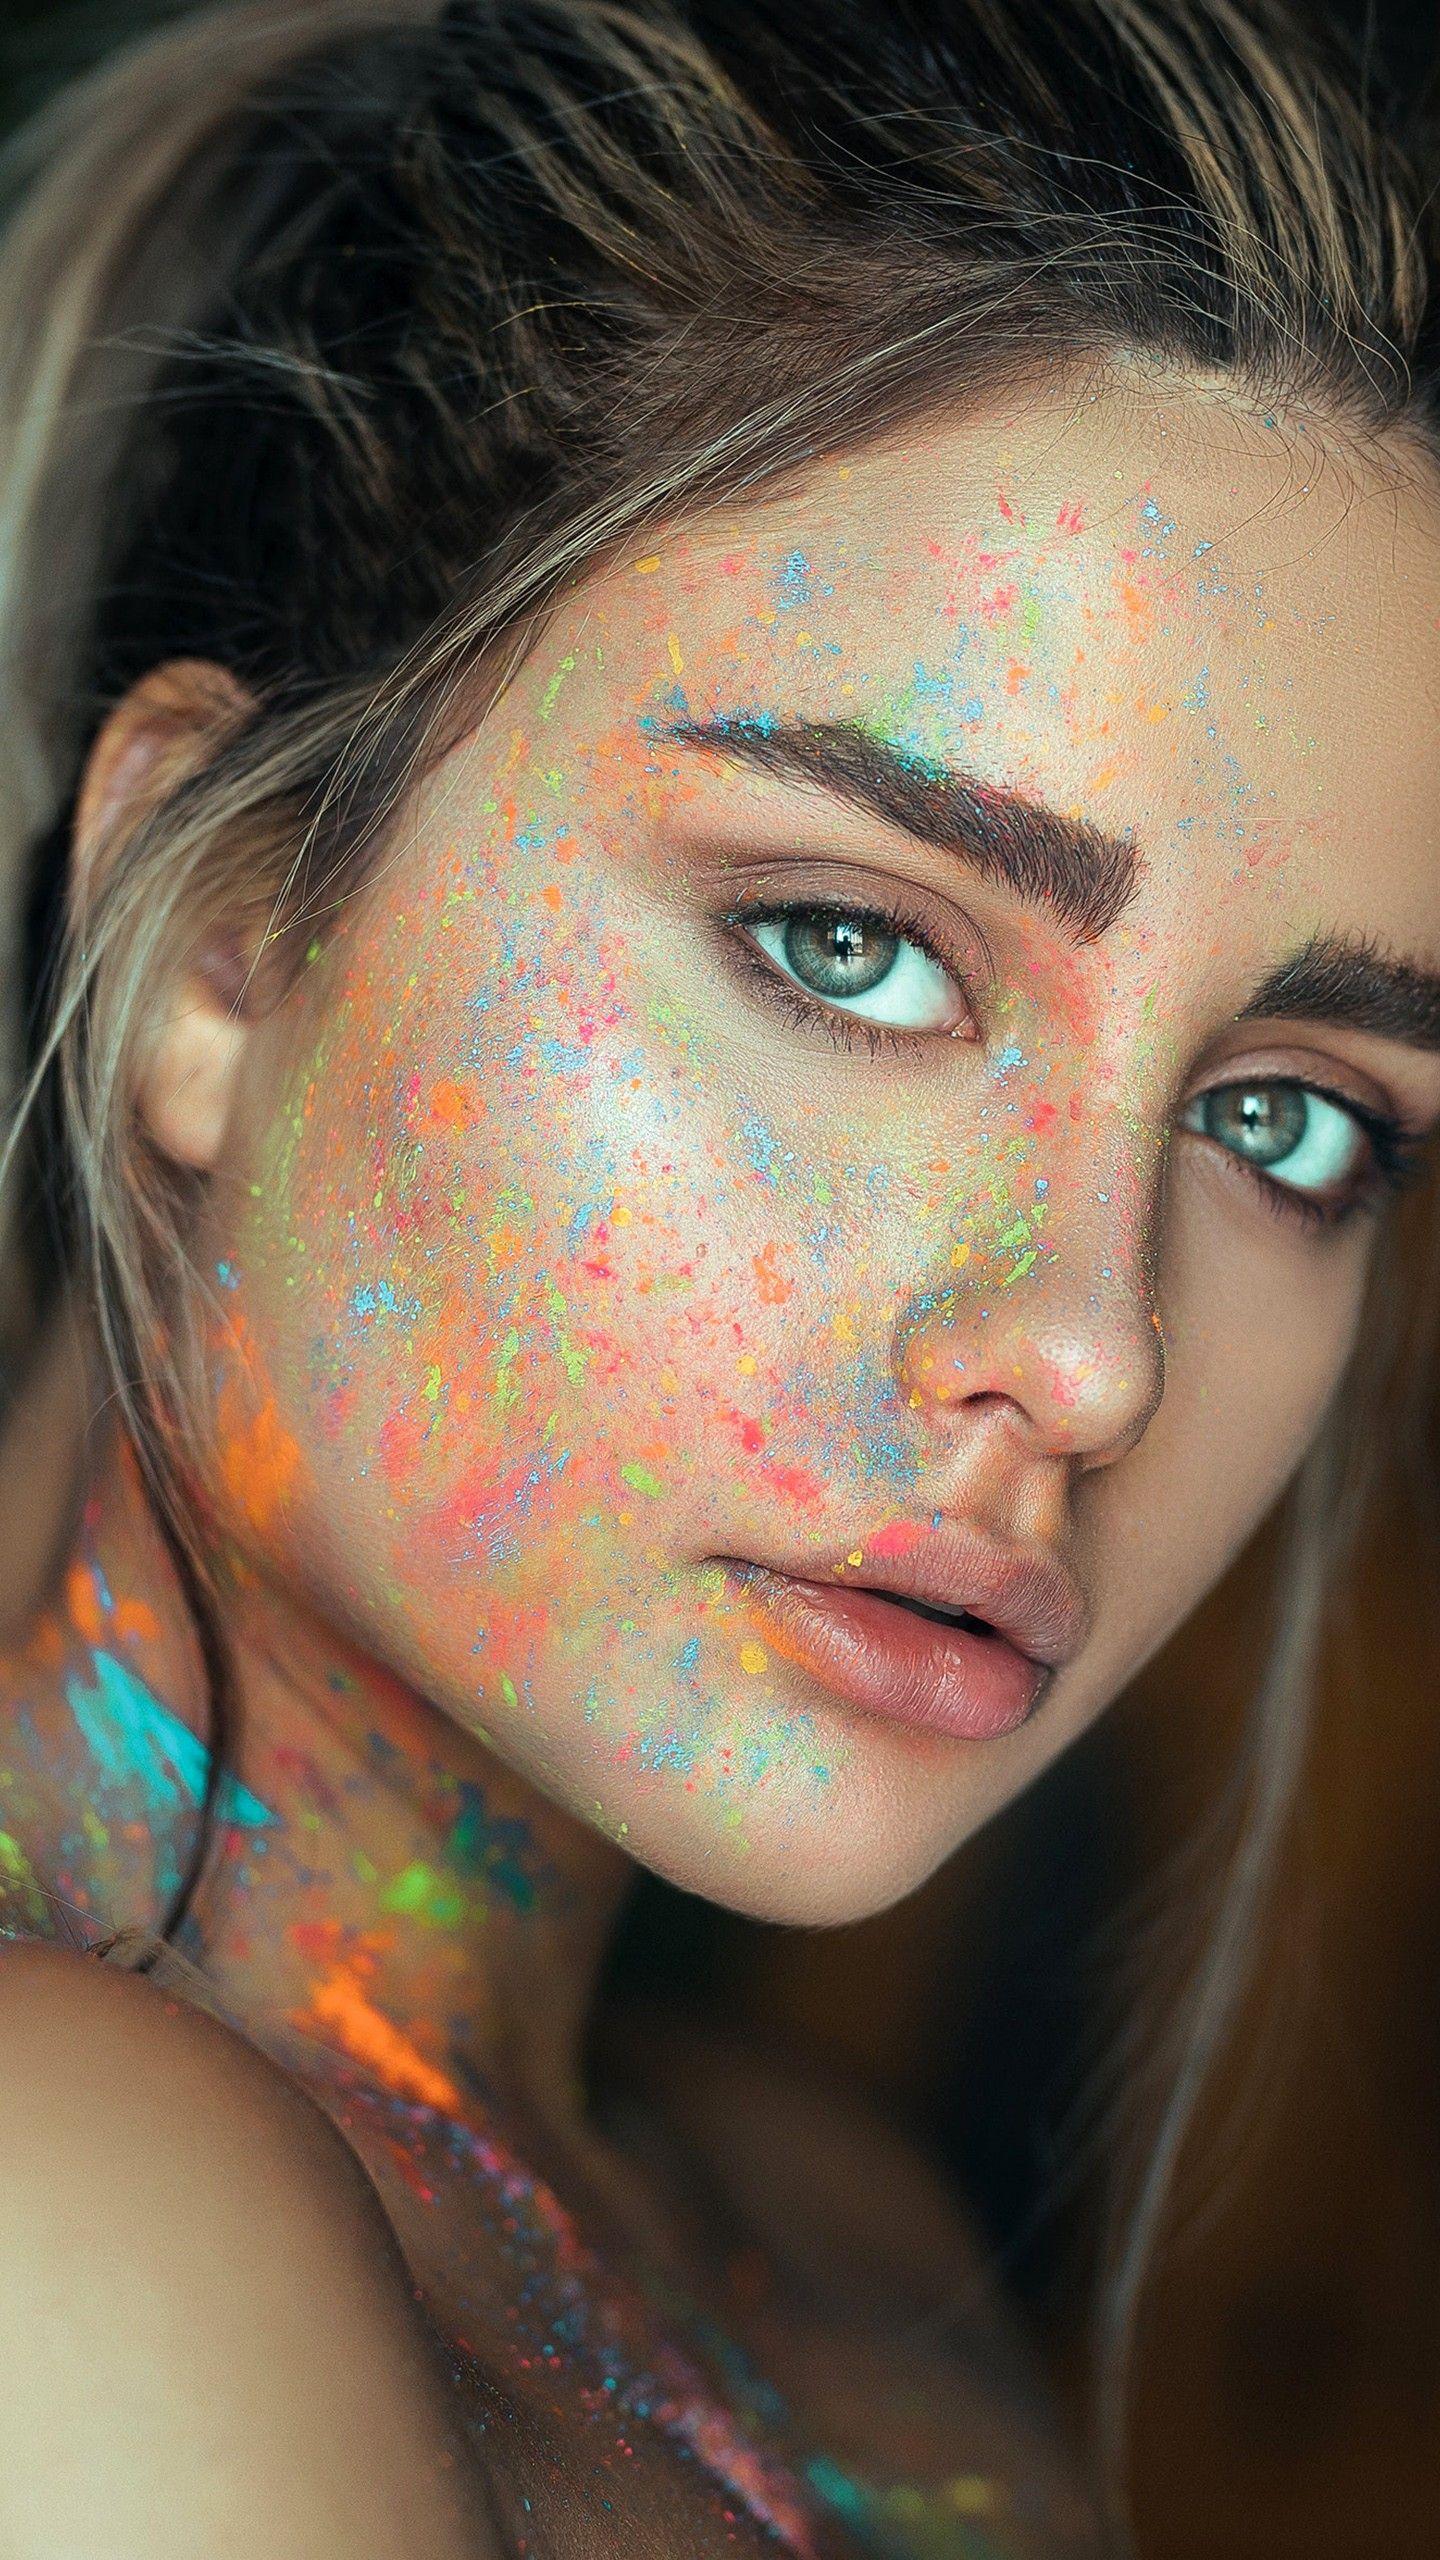 Samsung Galaxy S20 Ultra Wallpapers - Wallpaper Cave